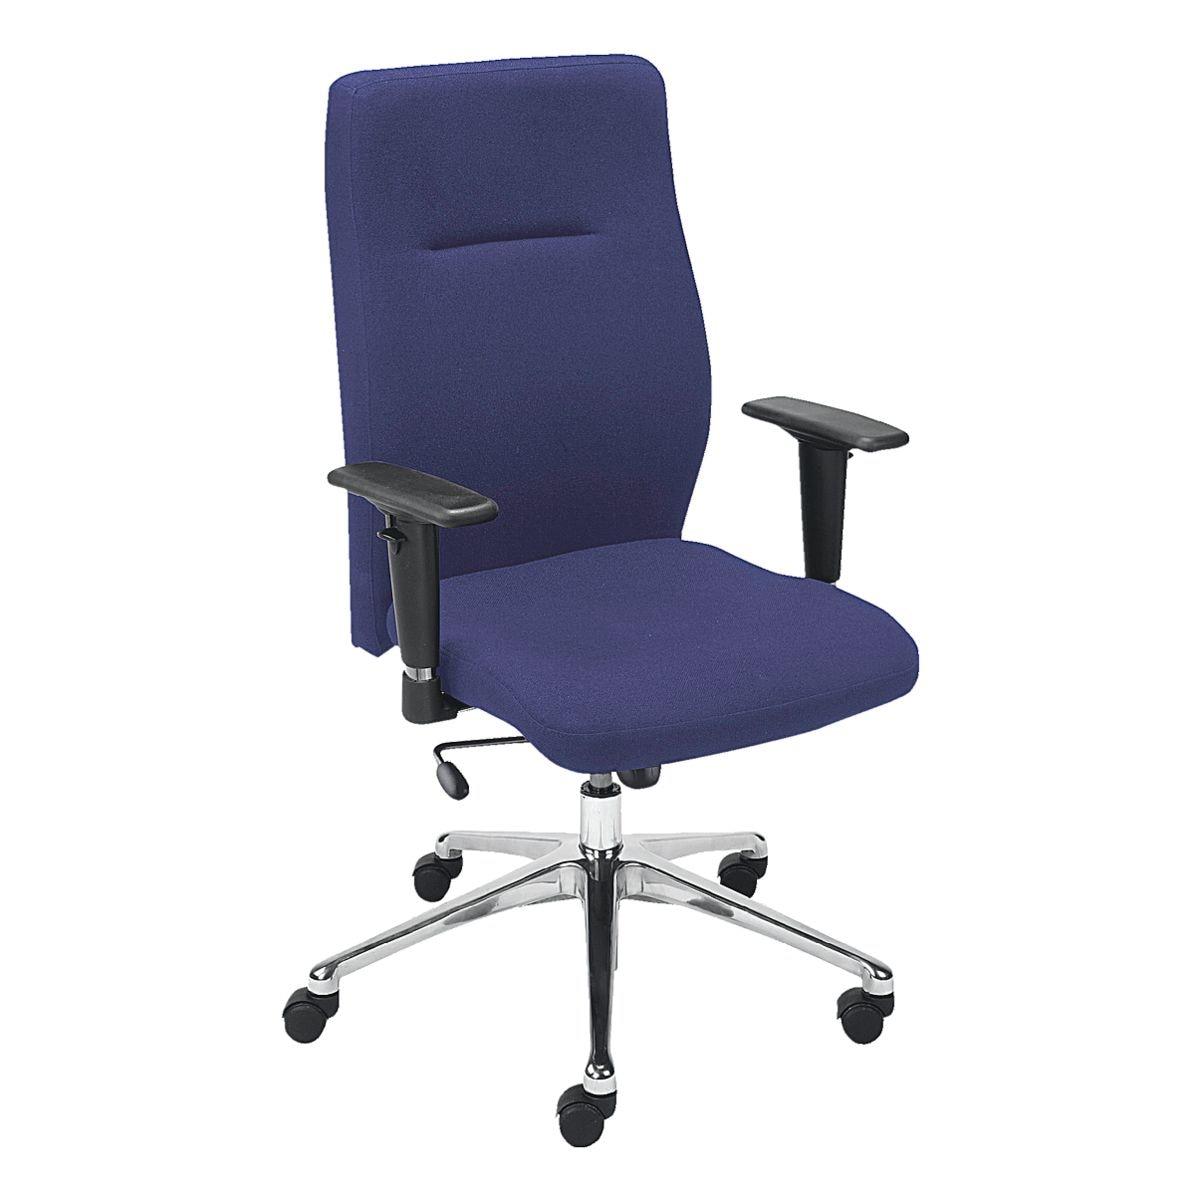 Bürostuhl Nowy Styl »Nero Eco« mit Armlehnen